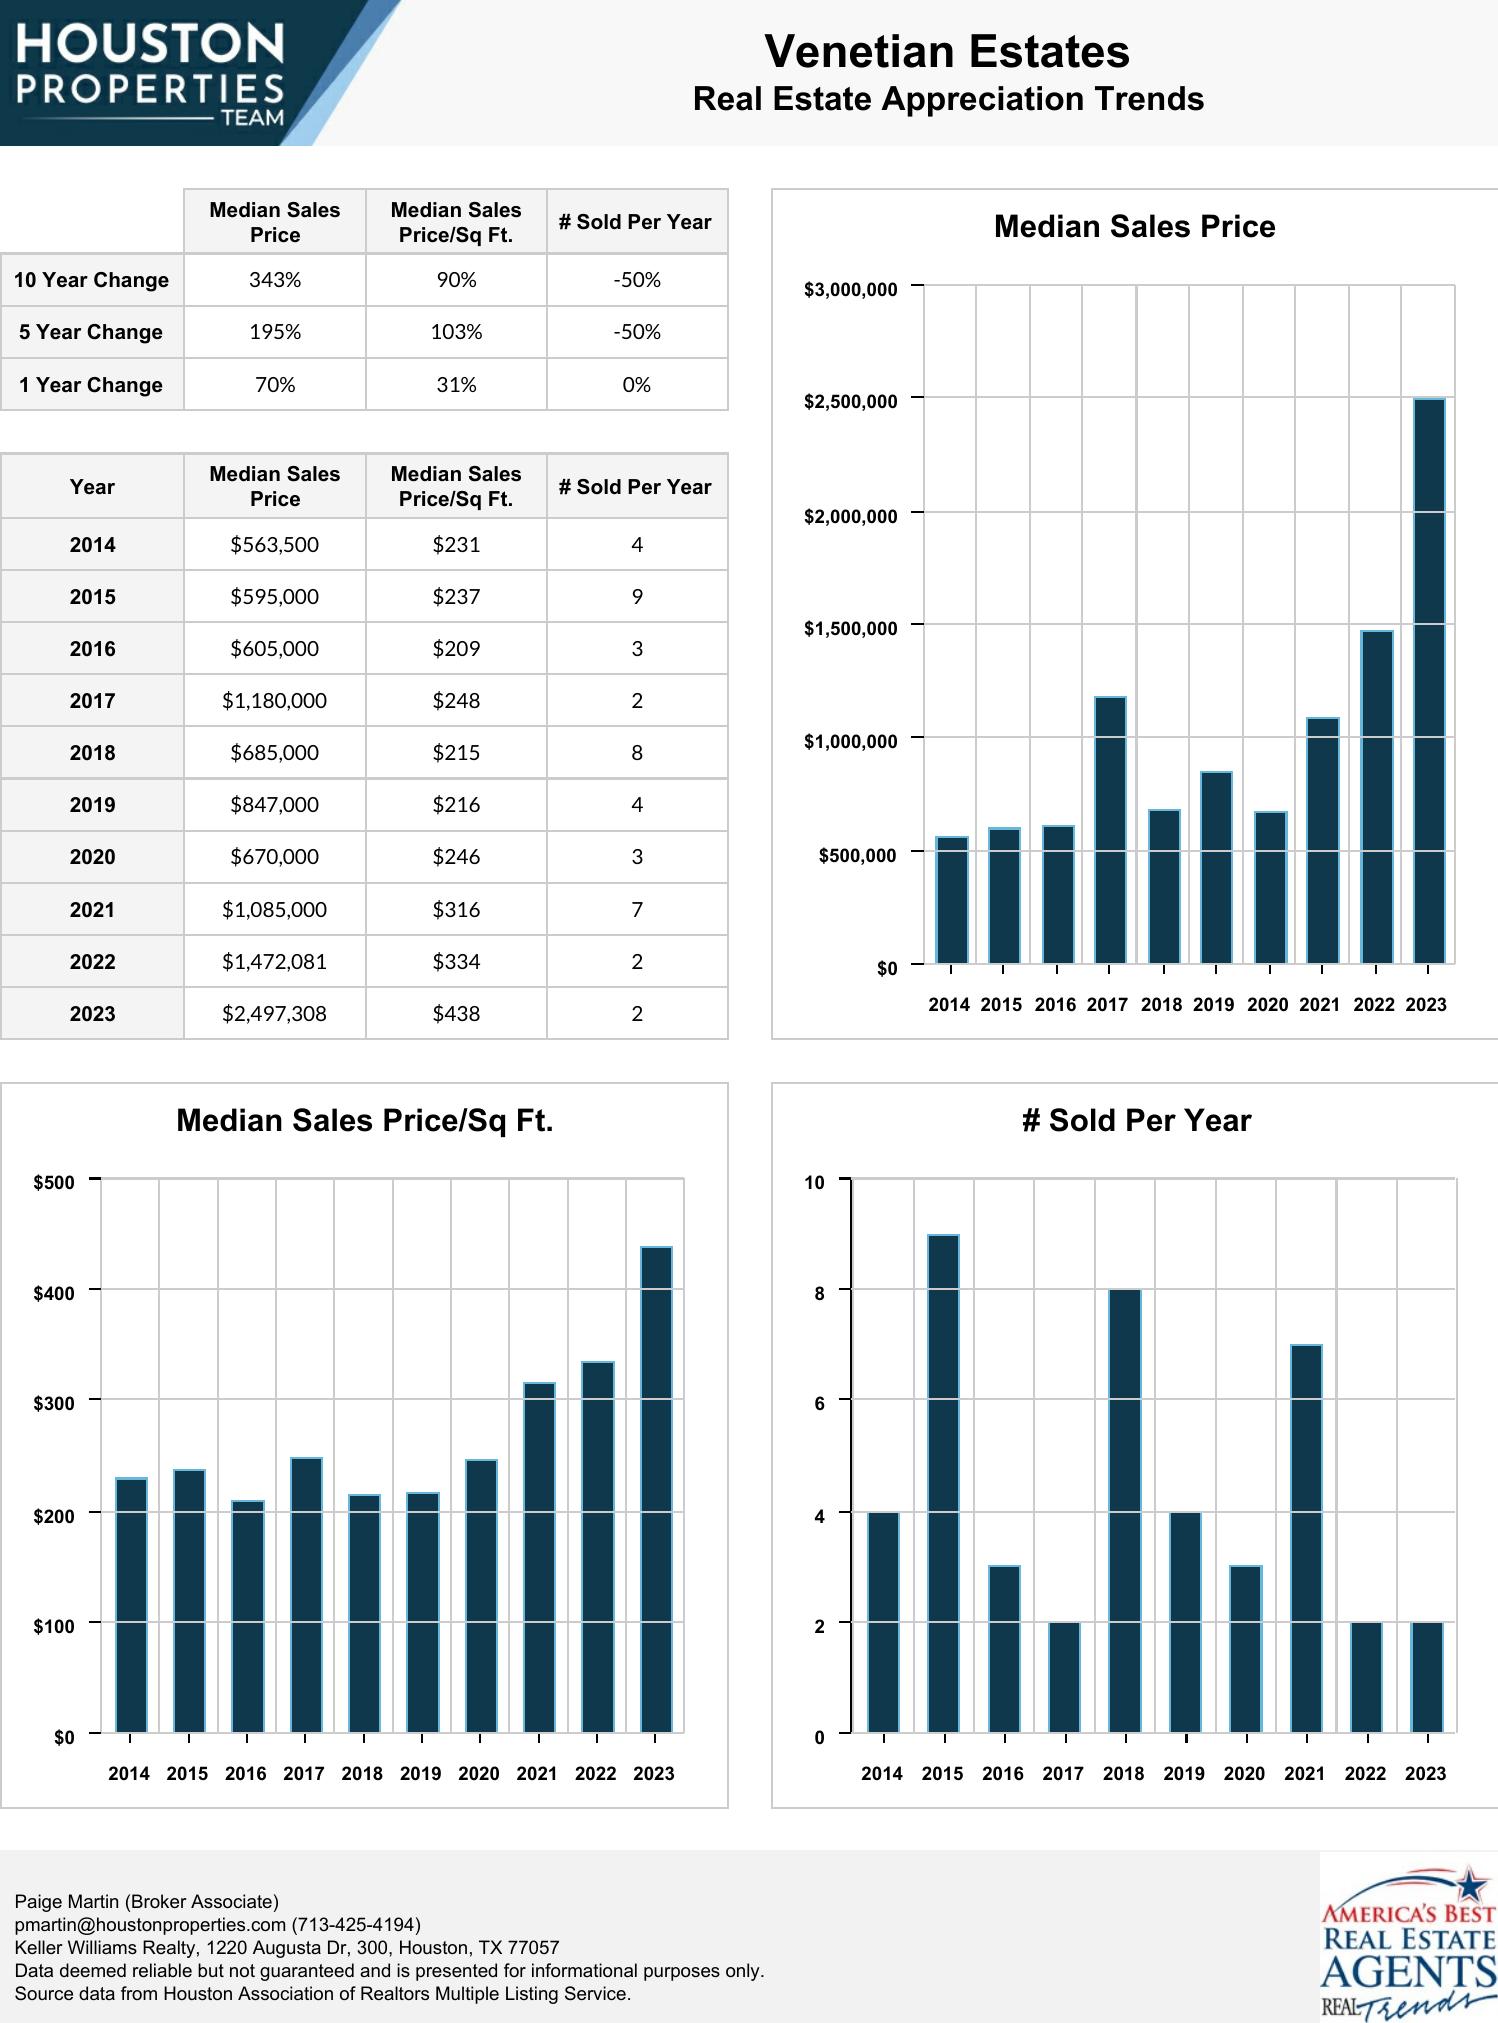 Venetian Estates Real Estate Trends